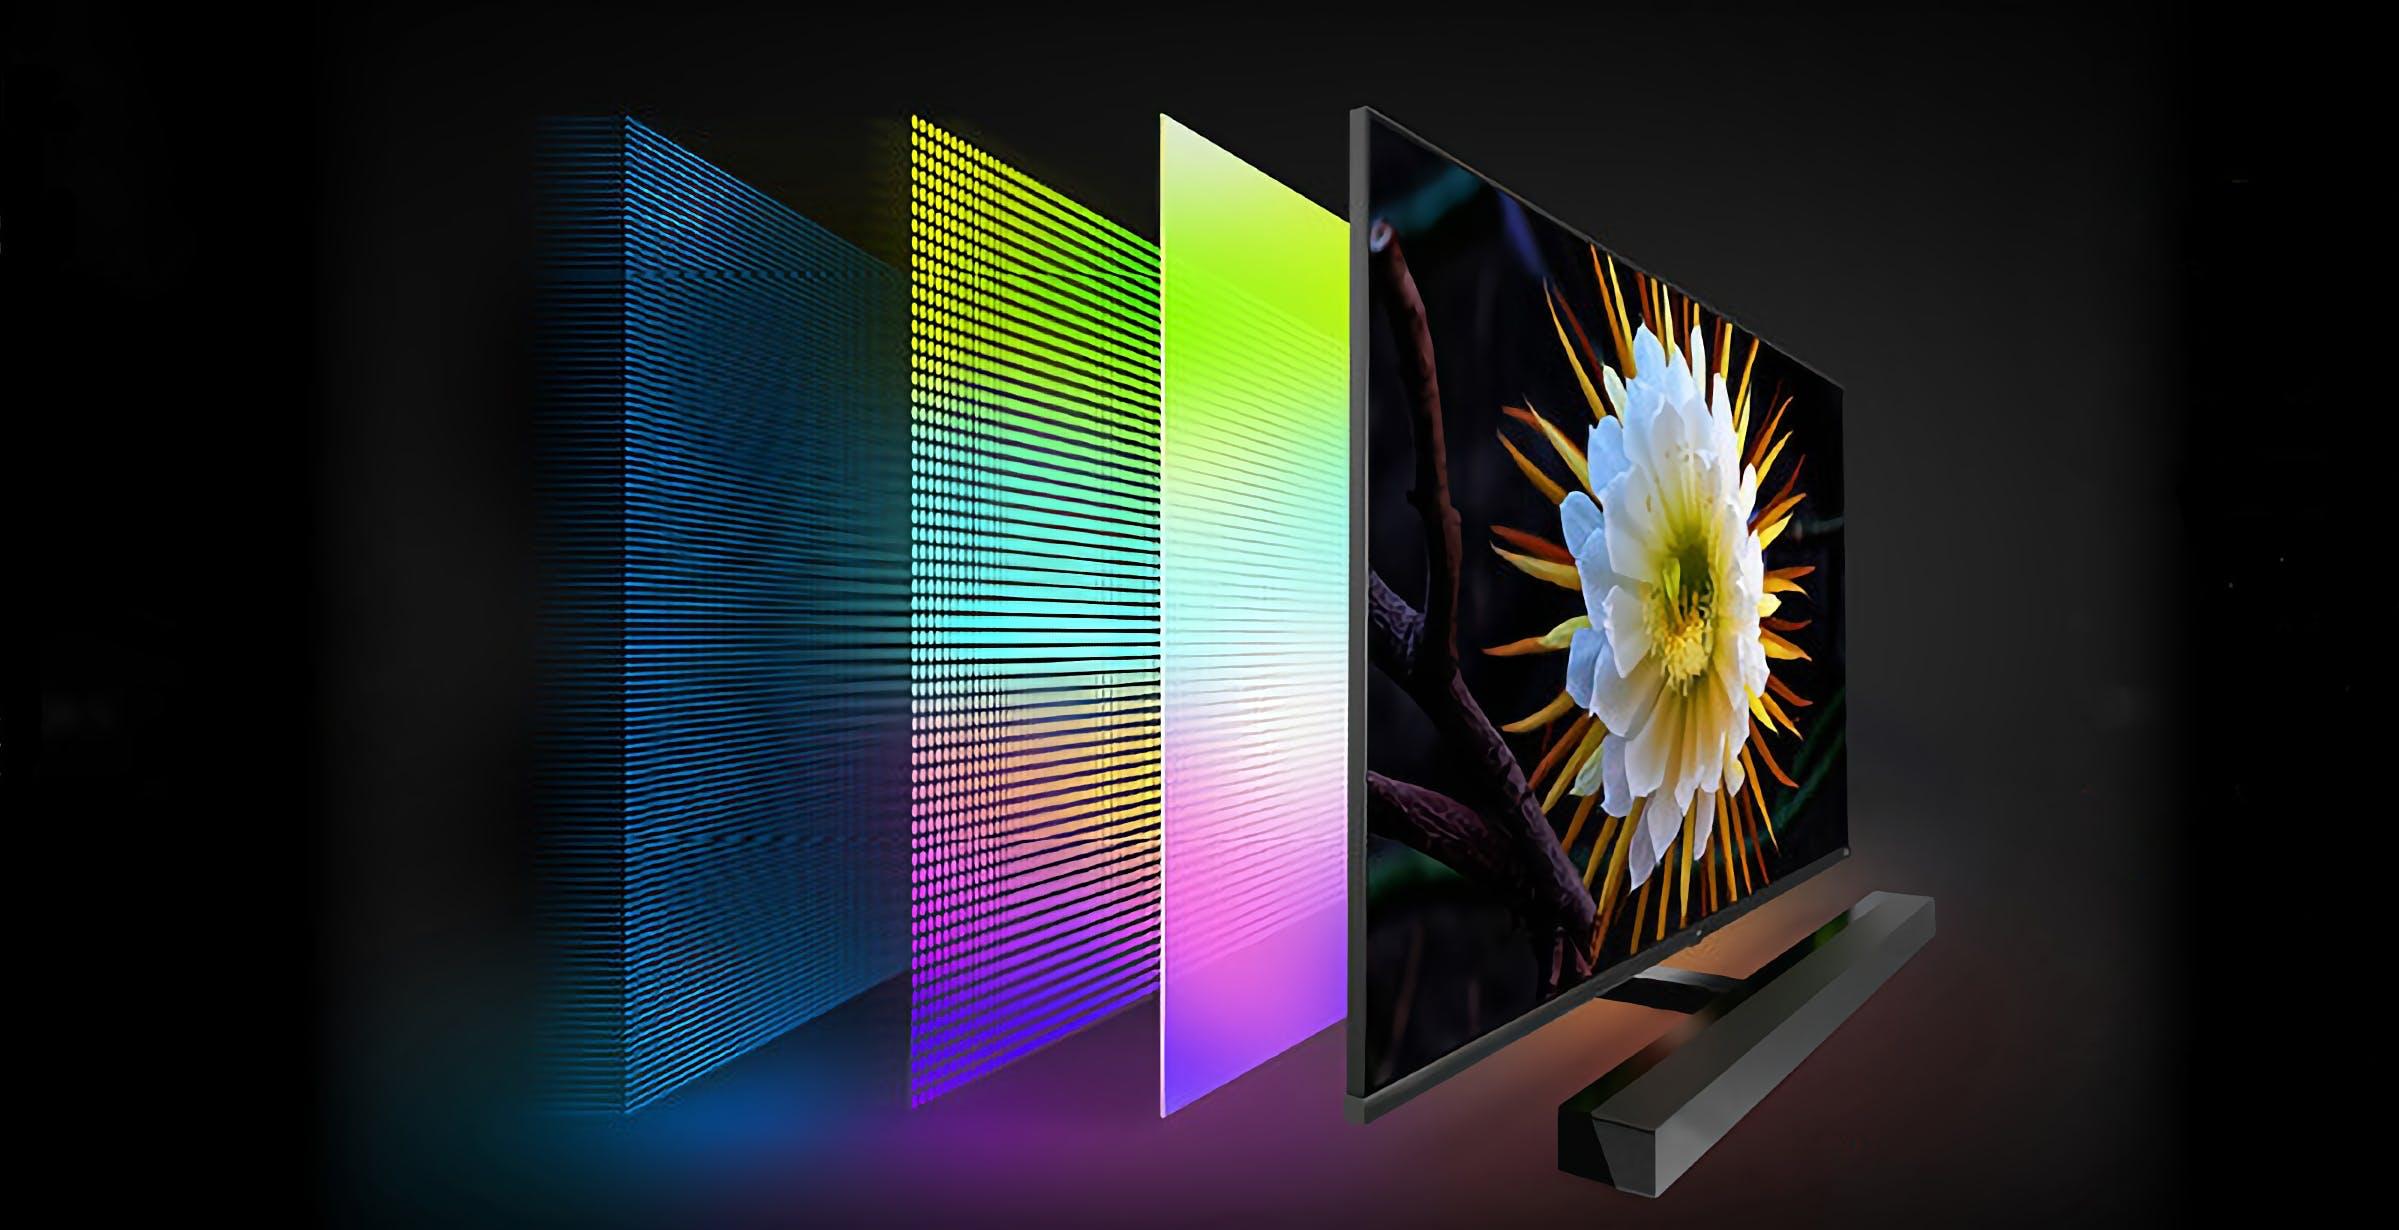 Samsung dice no ai display QD-OLED. Nel 2021 il focus sarà solo sui QLED con Mini LED